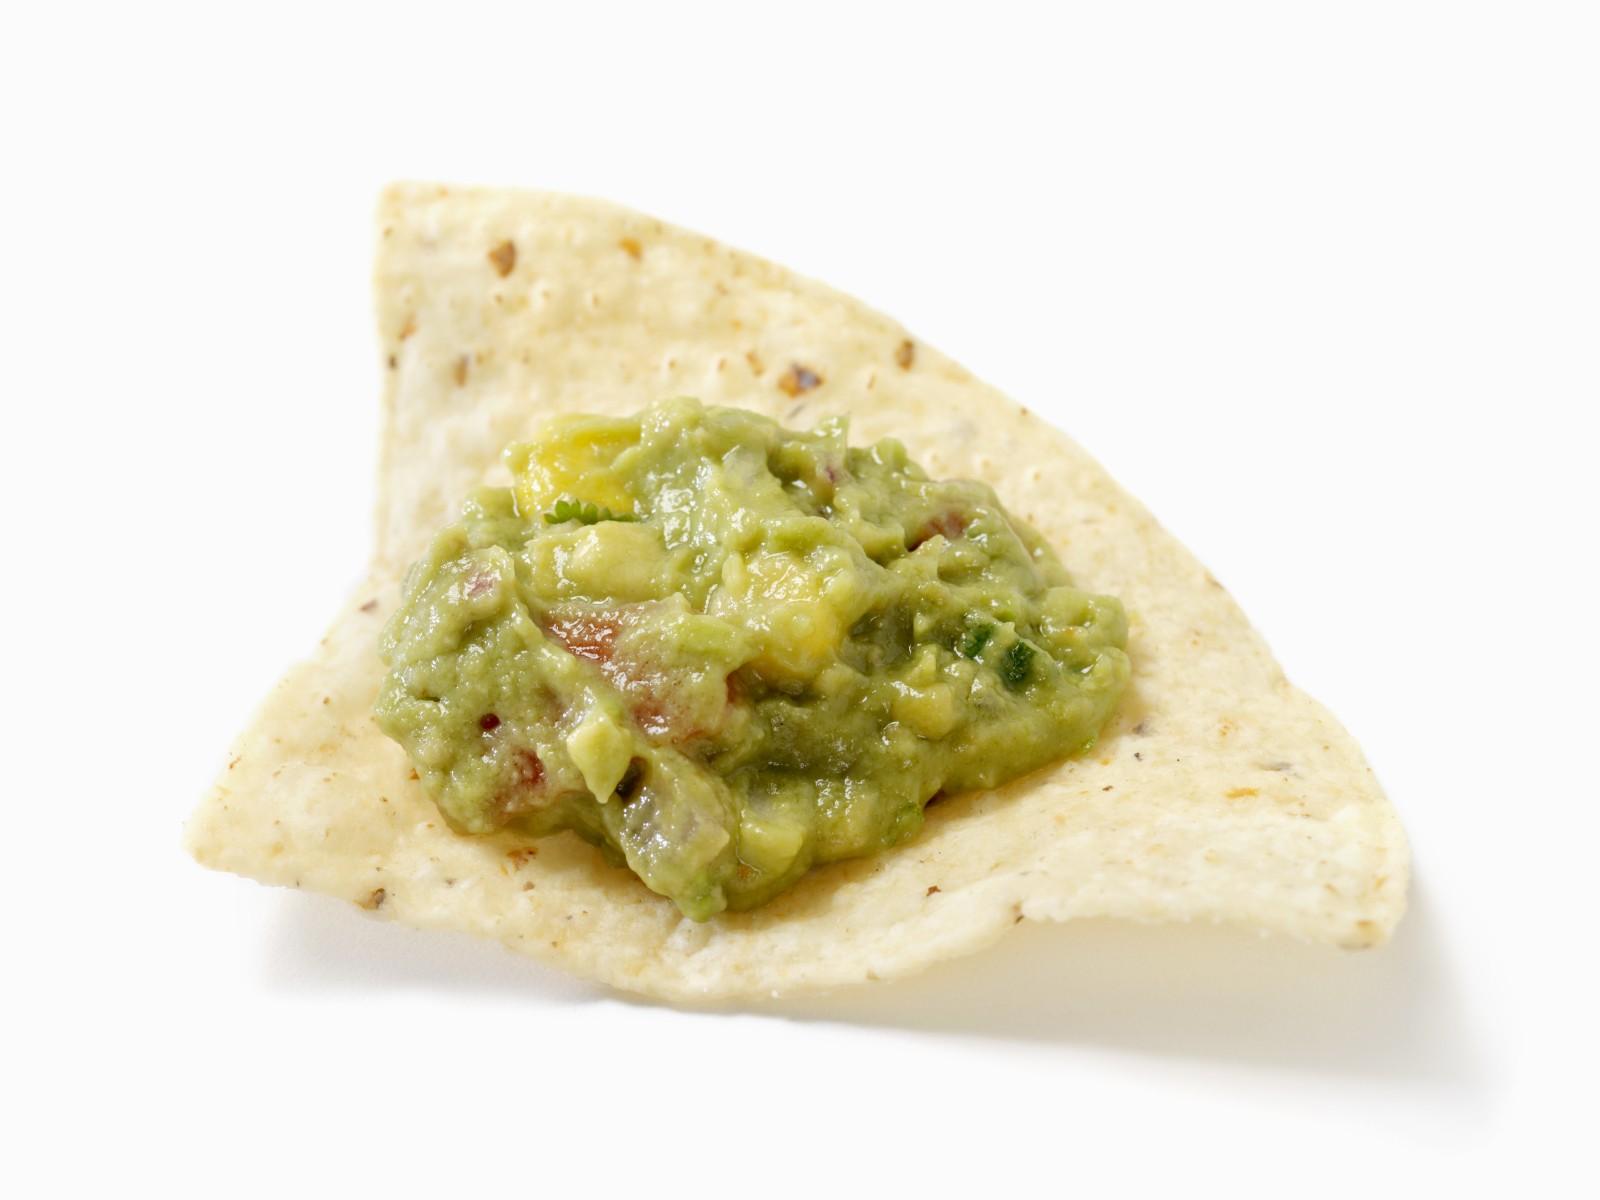 Tortilla Chip with Guacamole